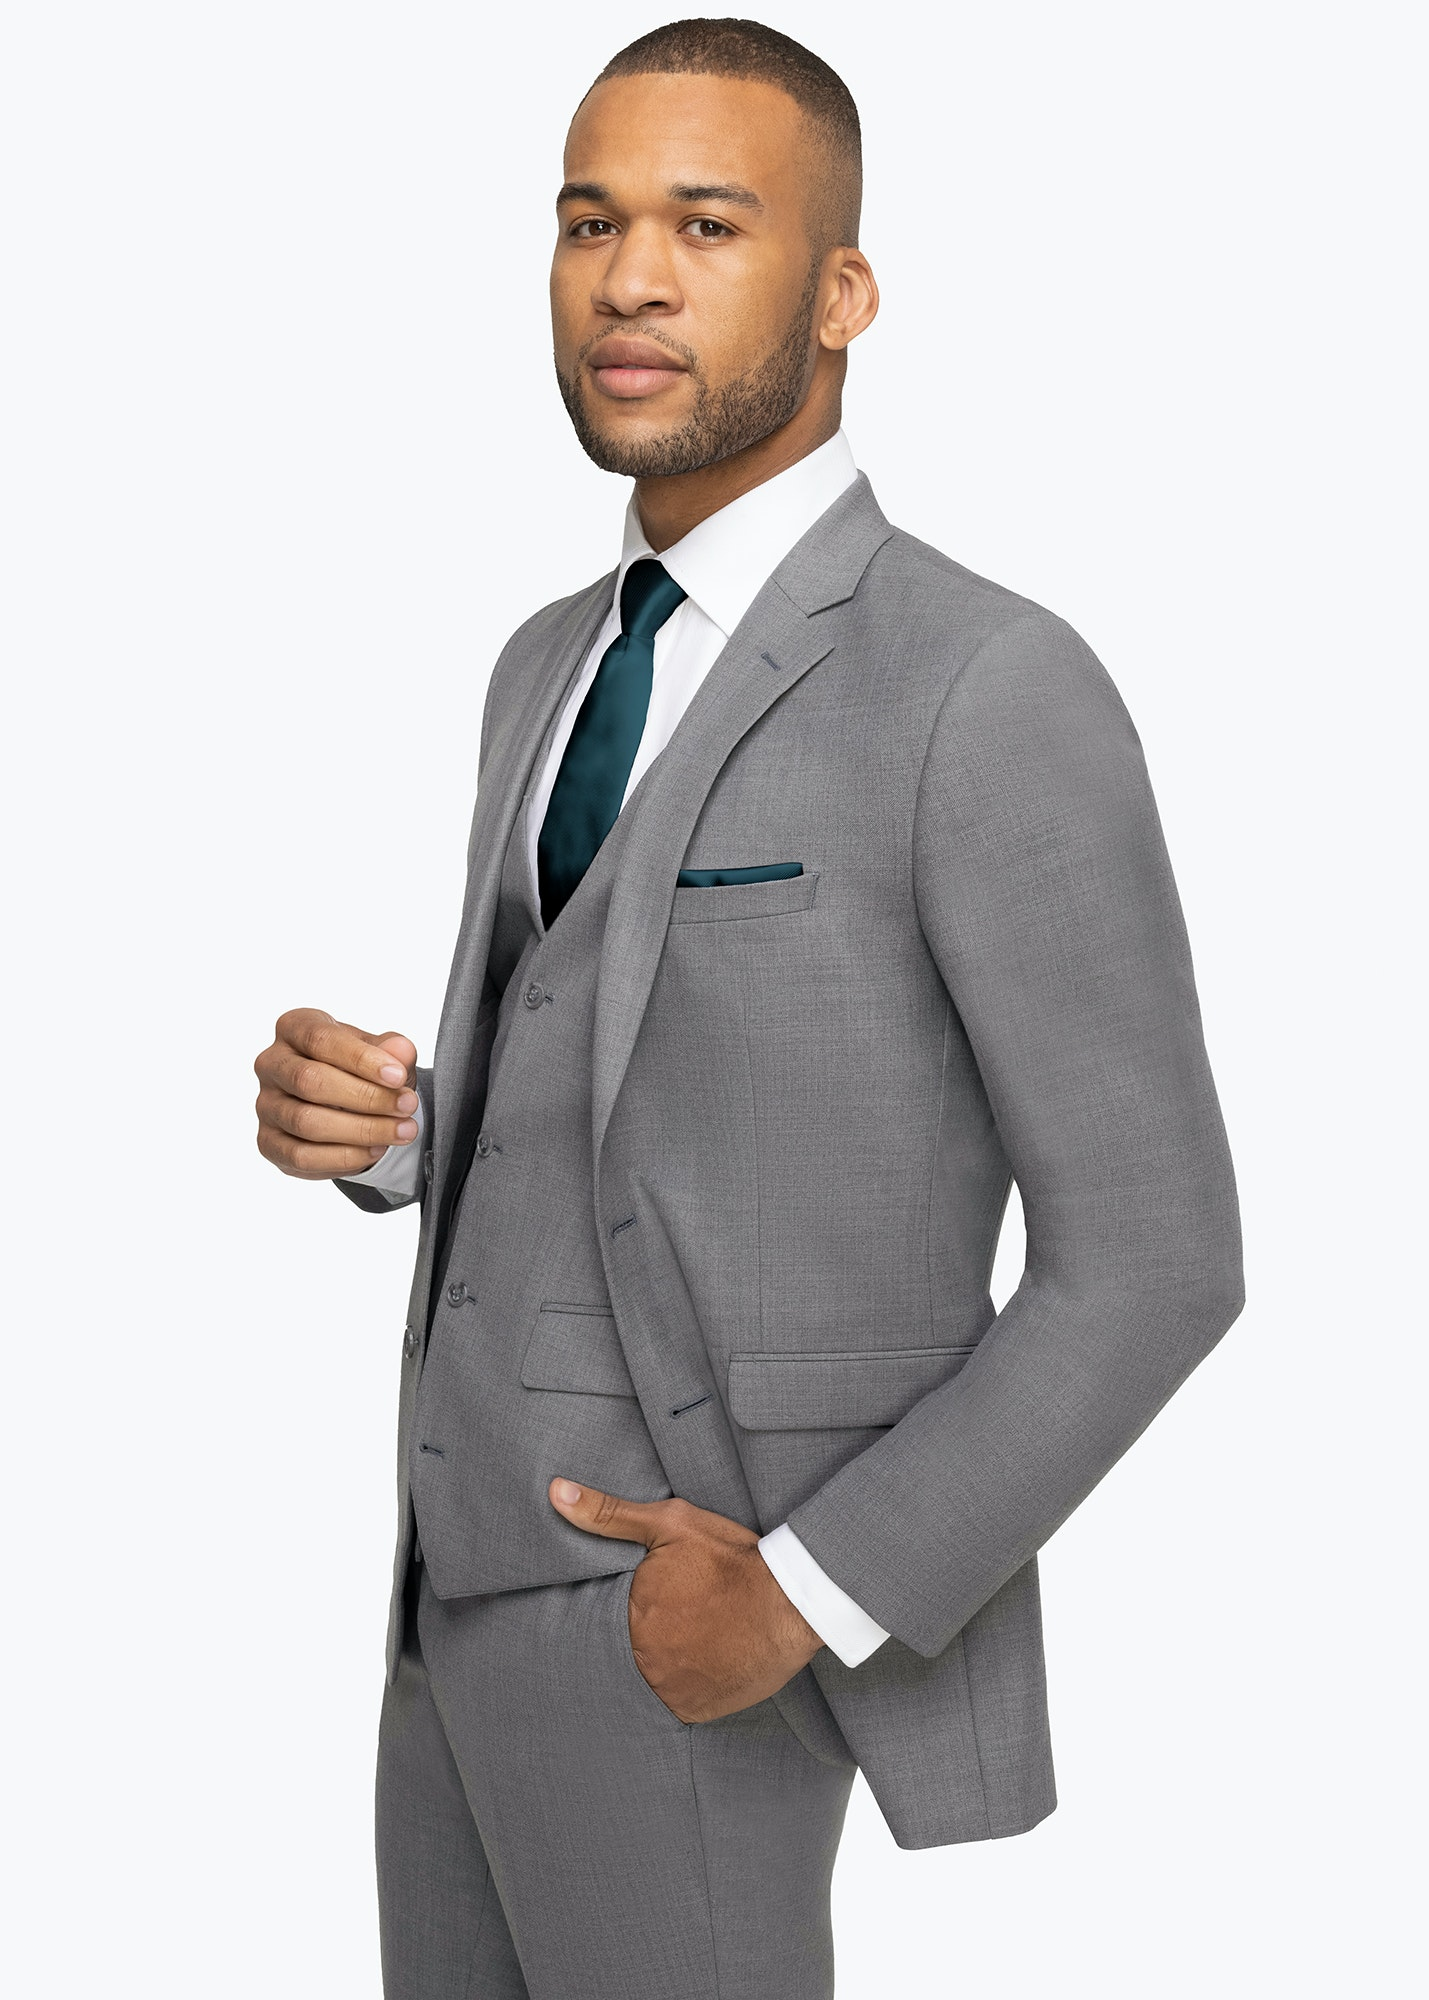 Model in Allure Light Gray Suit